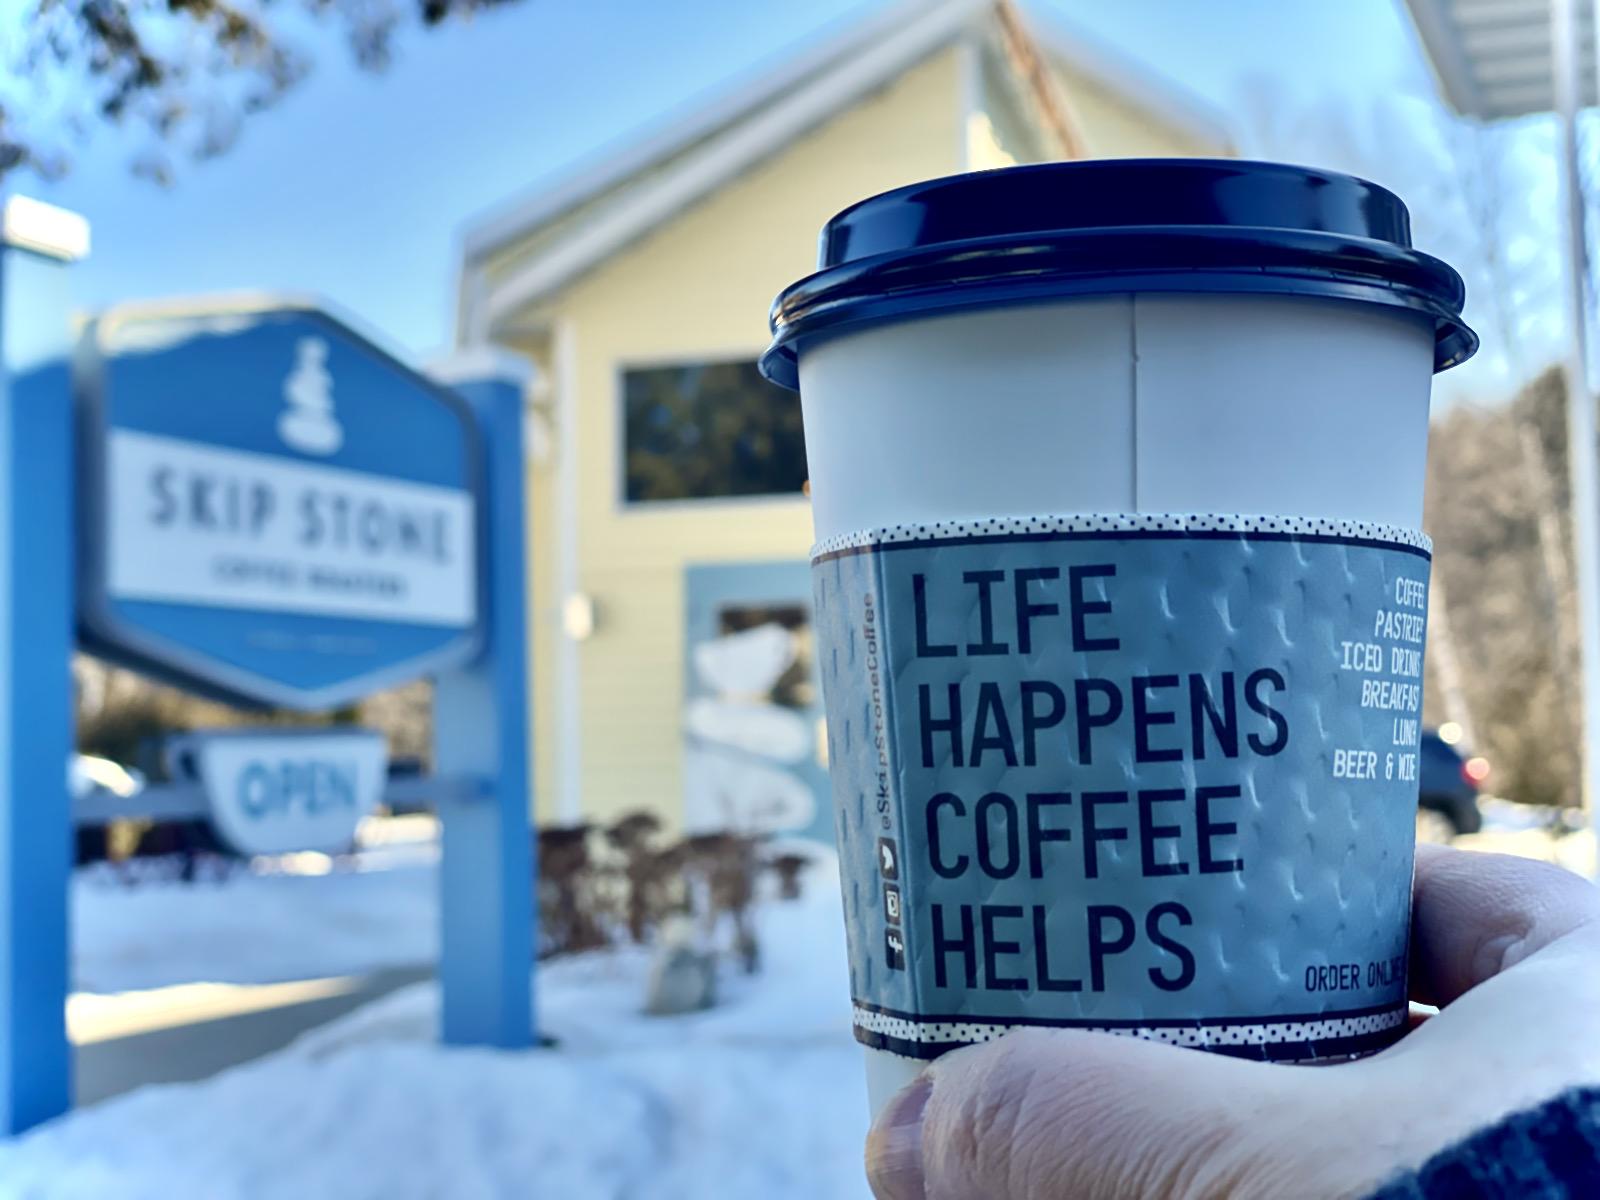 Coffee at Skip Stone